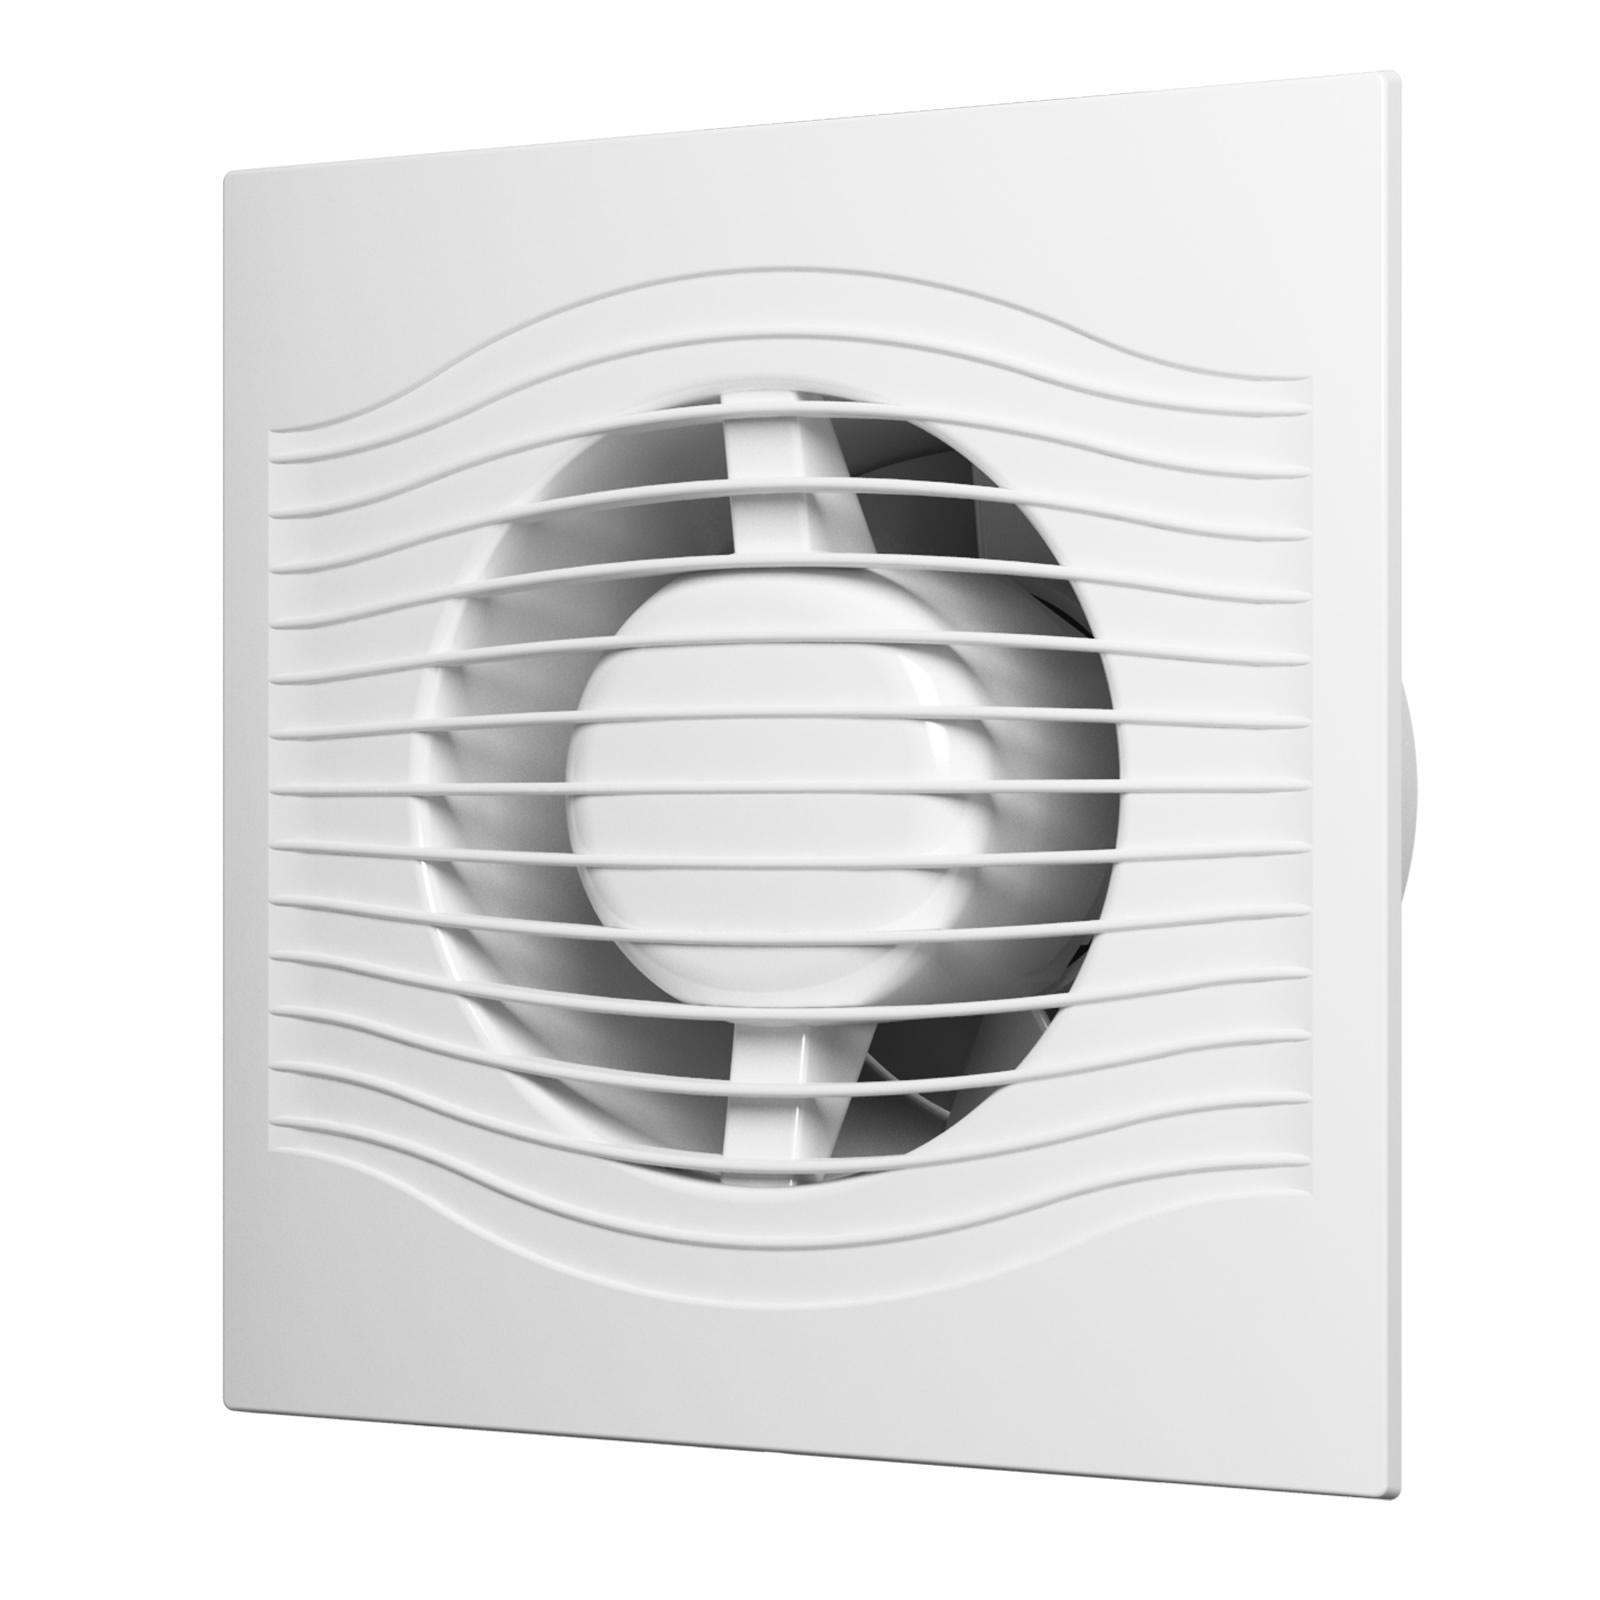 Вентилятор Diciti Slim 6c kumho kl 33 205 70r15 96 t